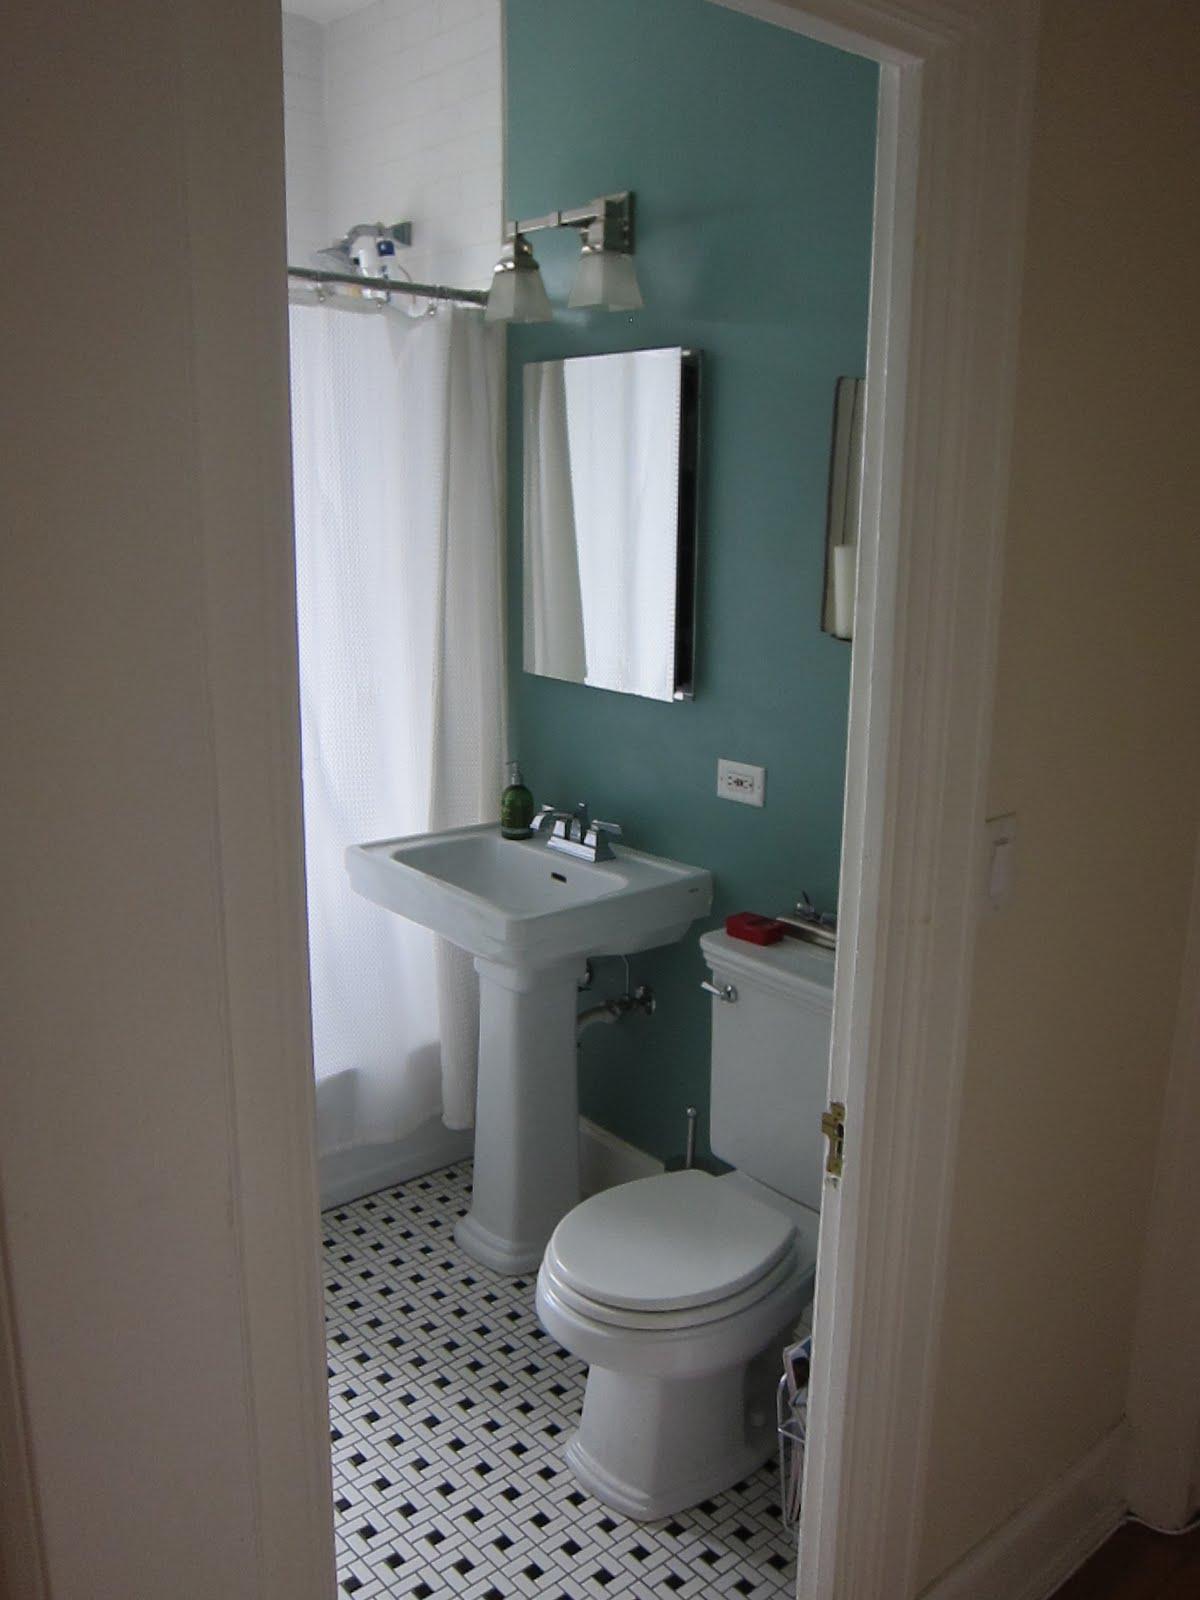 Granite Top Kitchen Table Materials The Chicago Real Estate Local: Andersonville Condo For ...